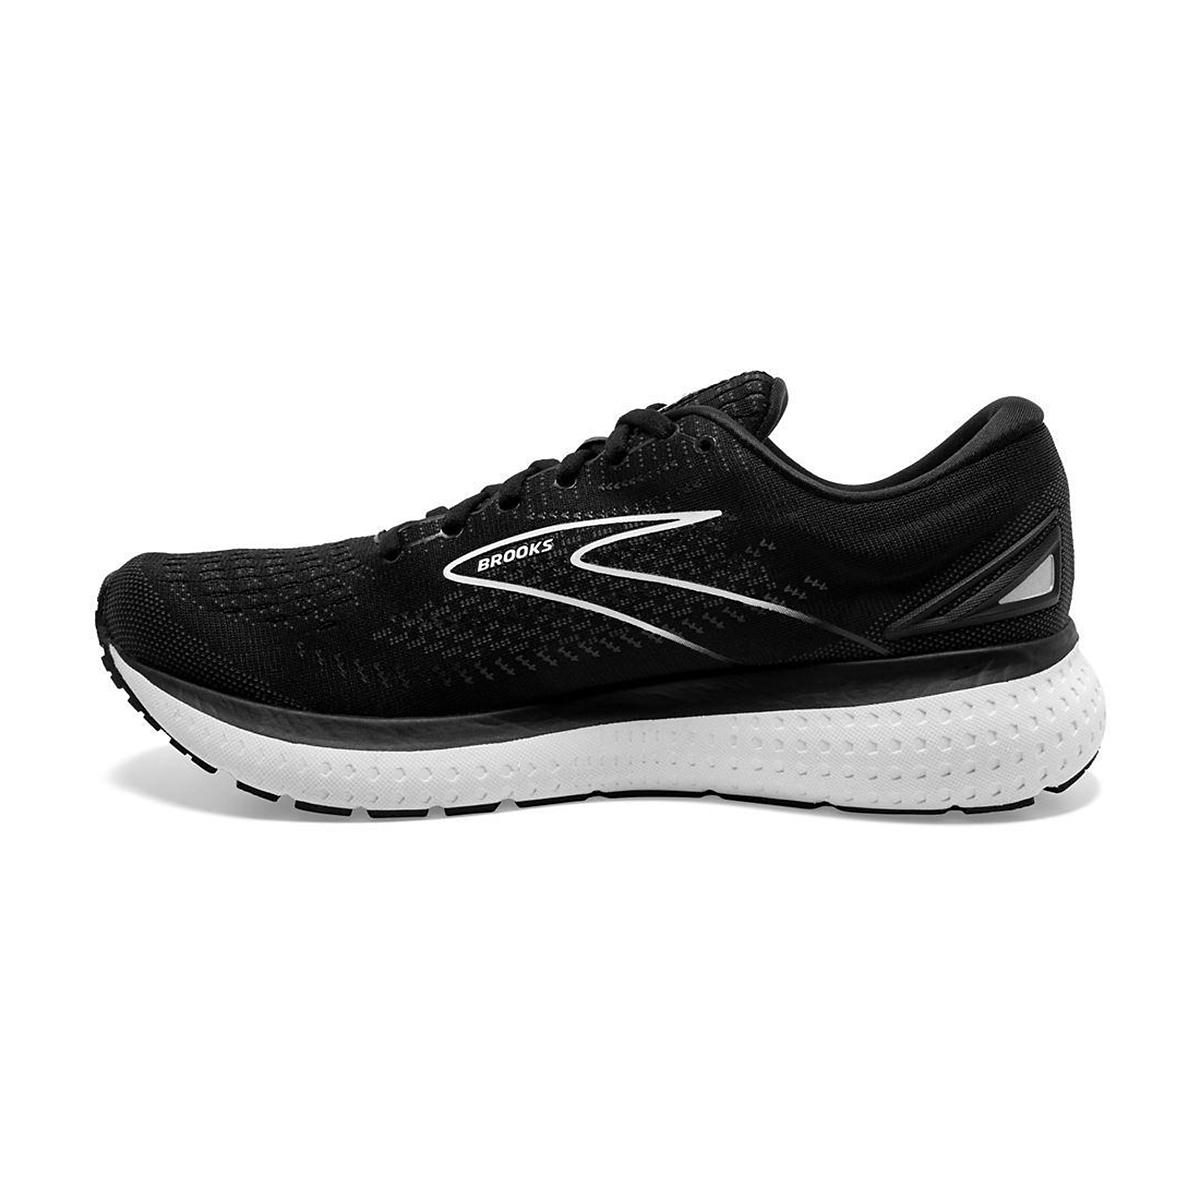 Women's Brooks Glycerin 19 Running Shoe - Color: Black/White - Size: 5 - Width: Regular, Black/White, large, image 2